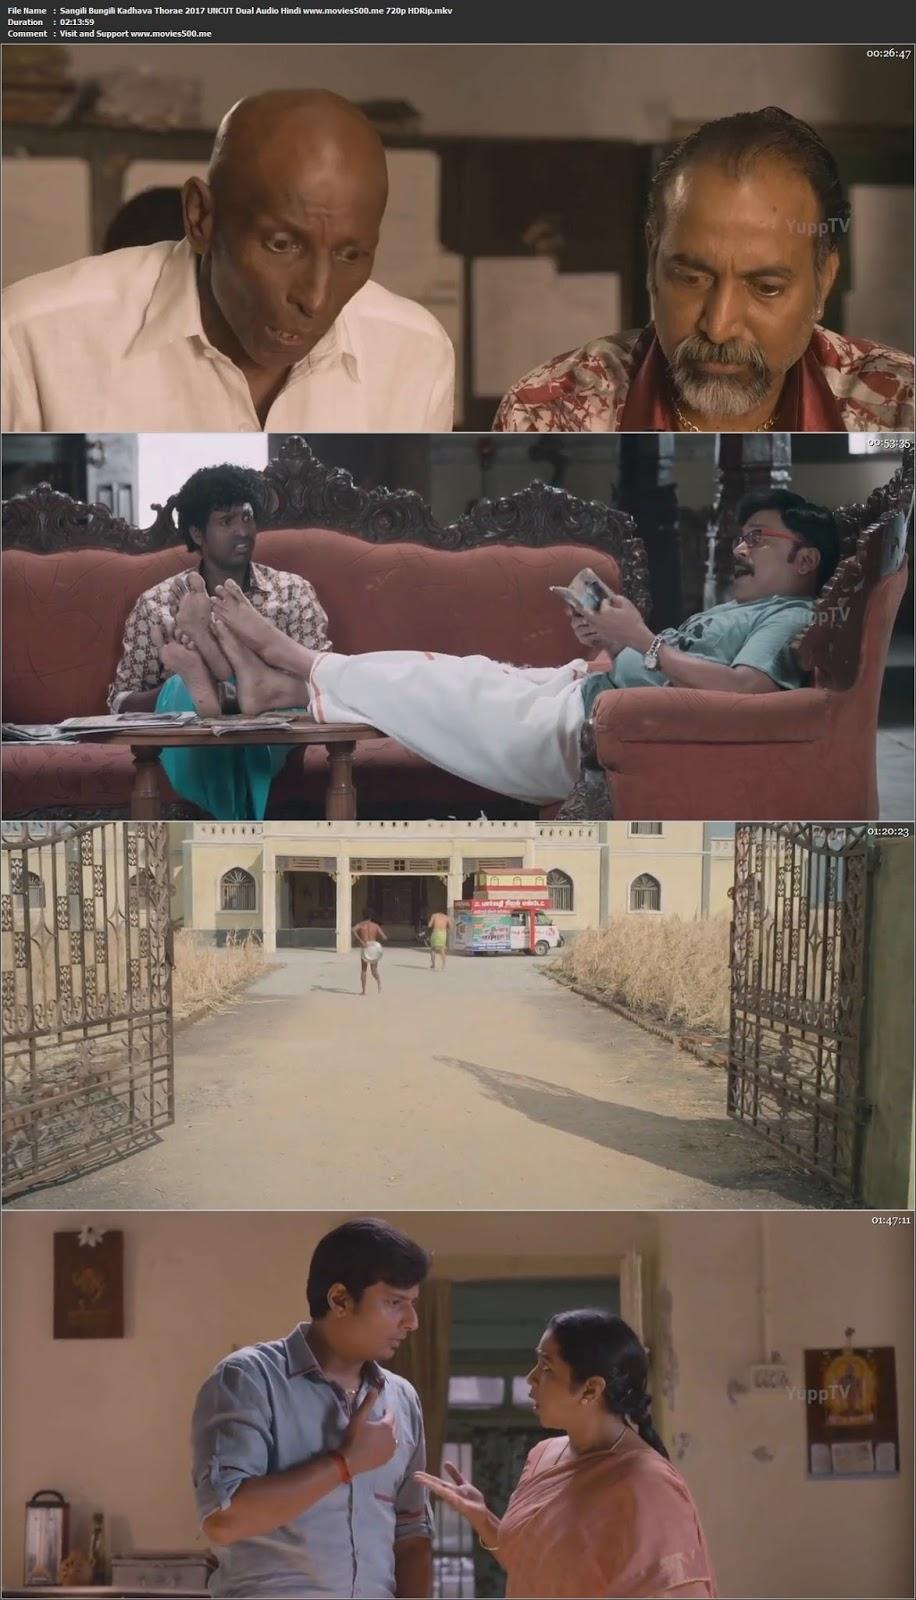 Sangili Bungili Kadhava Thorae 2017 UNCUT Dual Audio Hindi HDRip 720p at xn--o9jyb9aa09c103qnhe3m5i.com